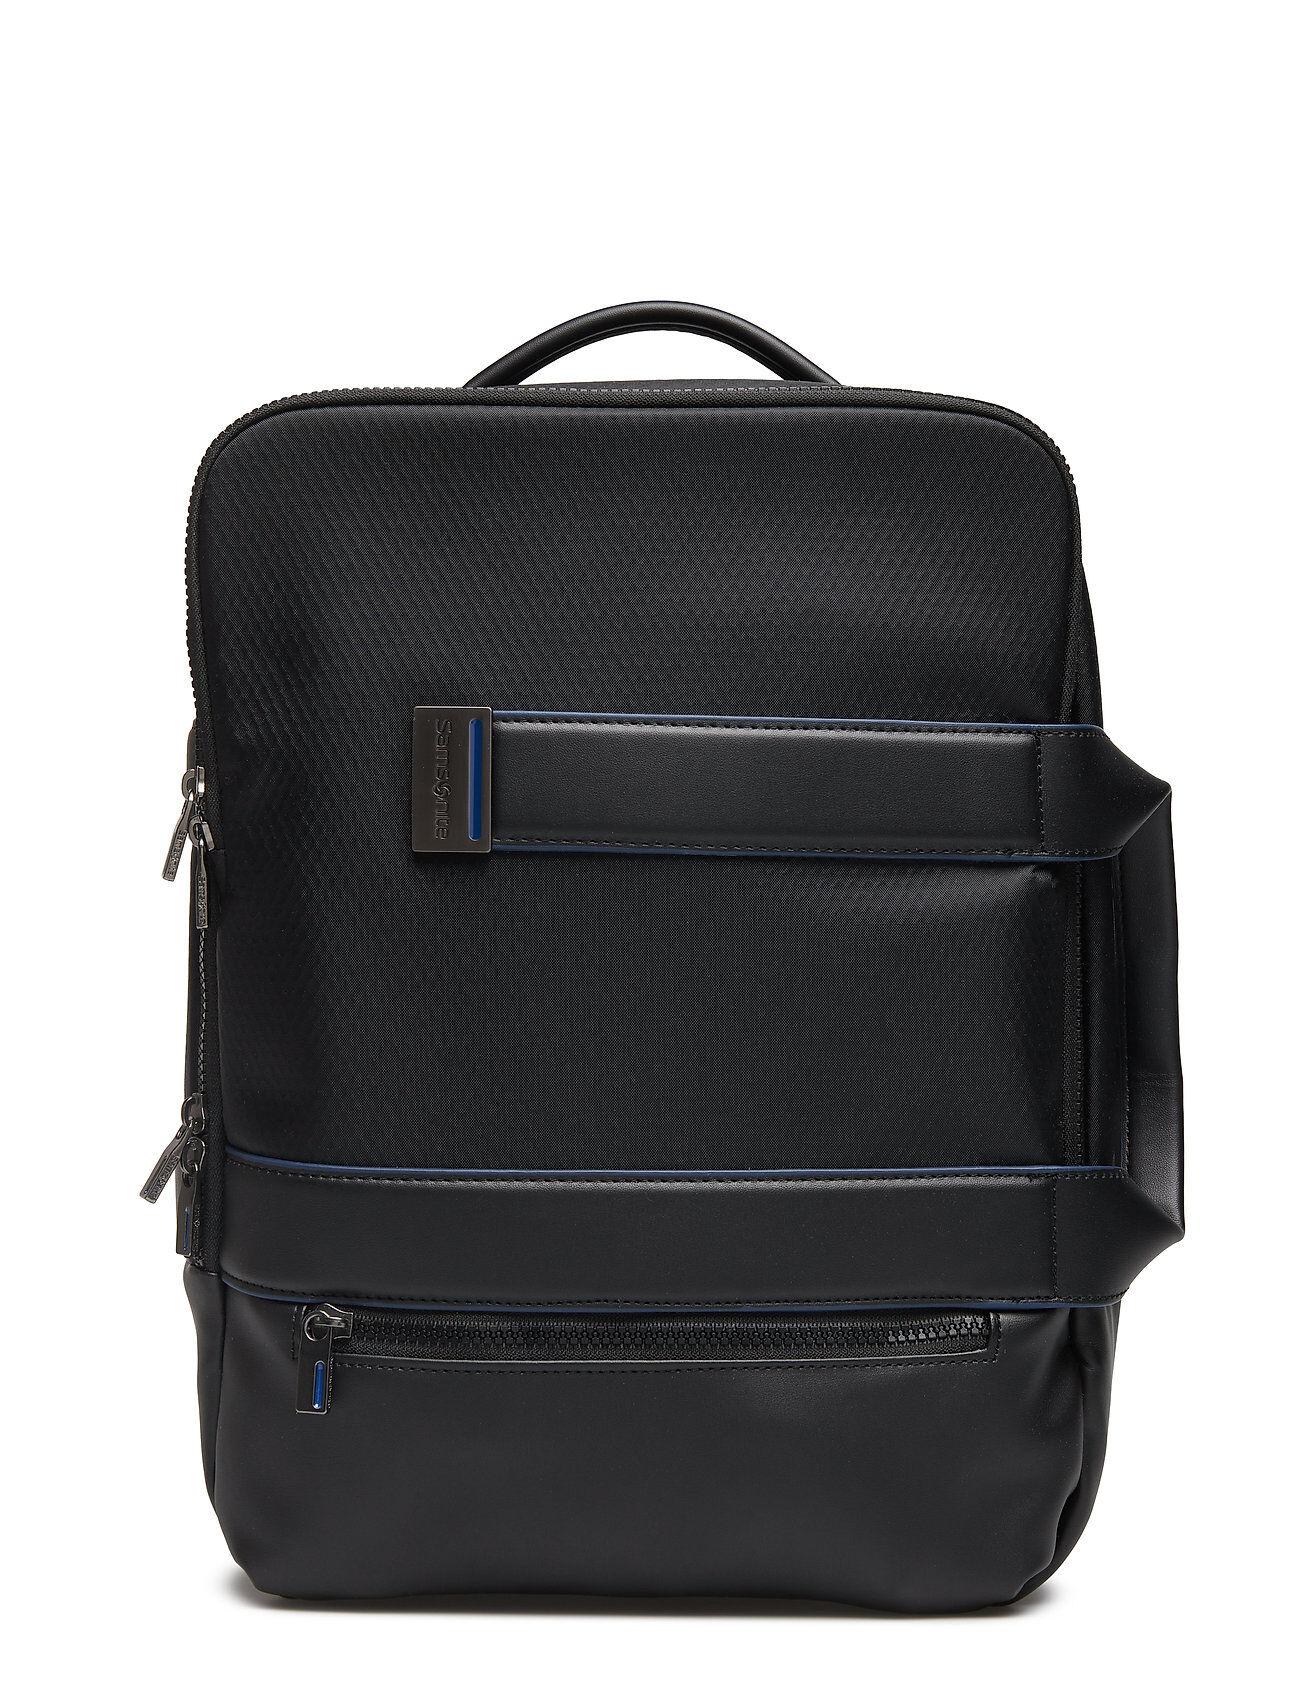 Samsonite Zigo 3-Way Shoulder Bag M